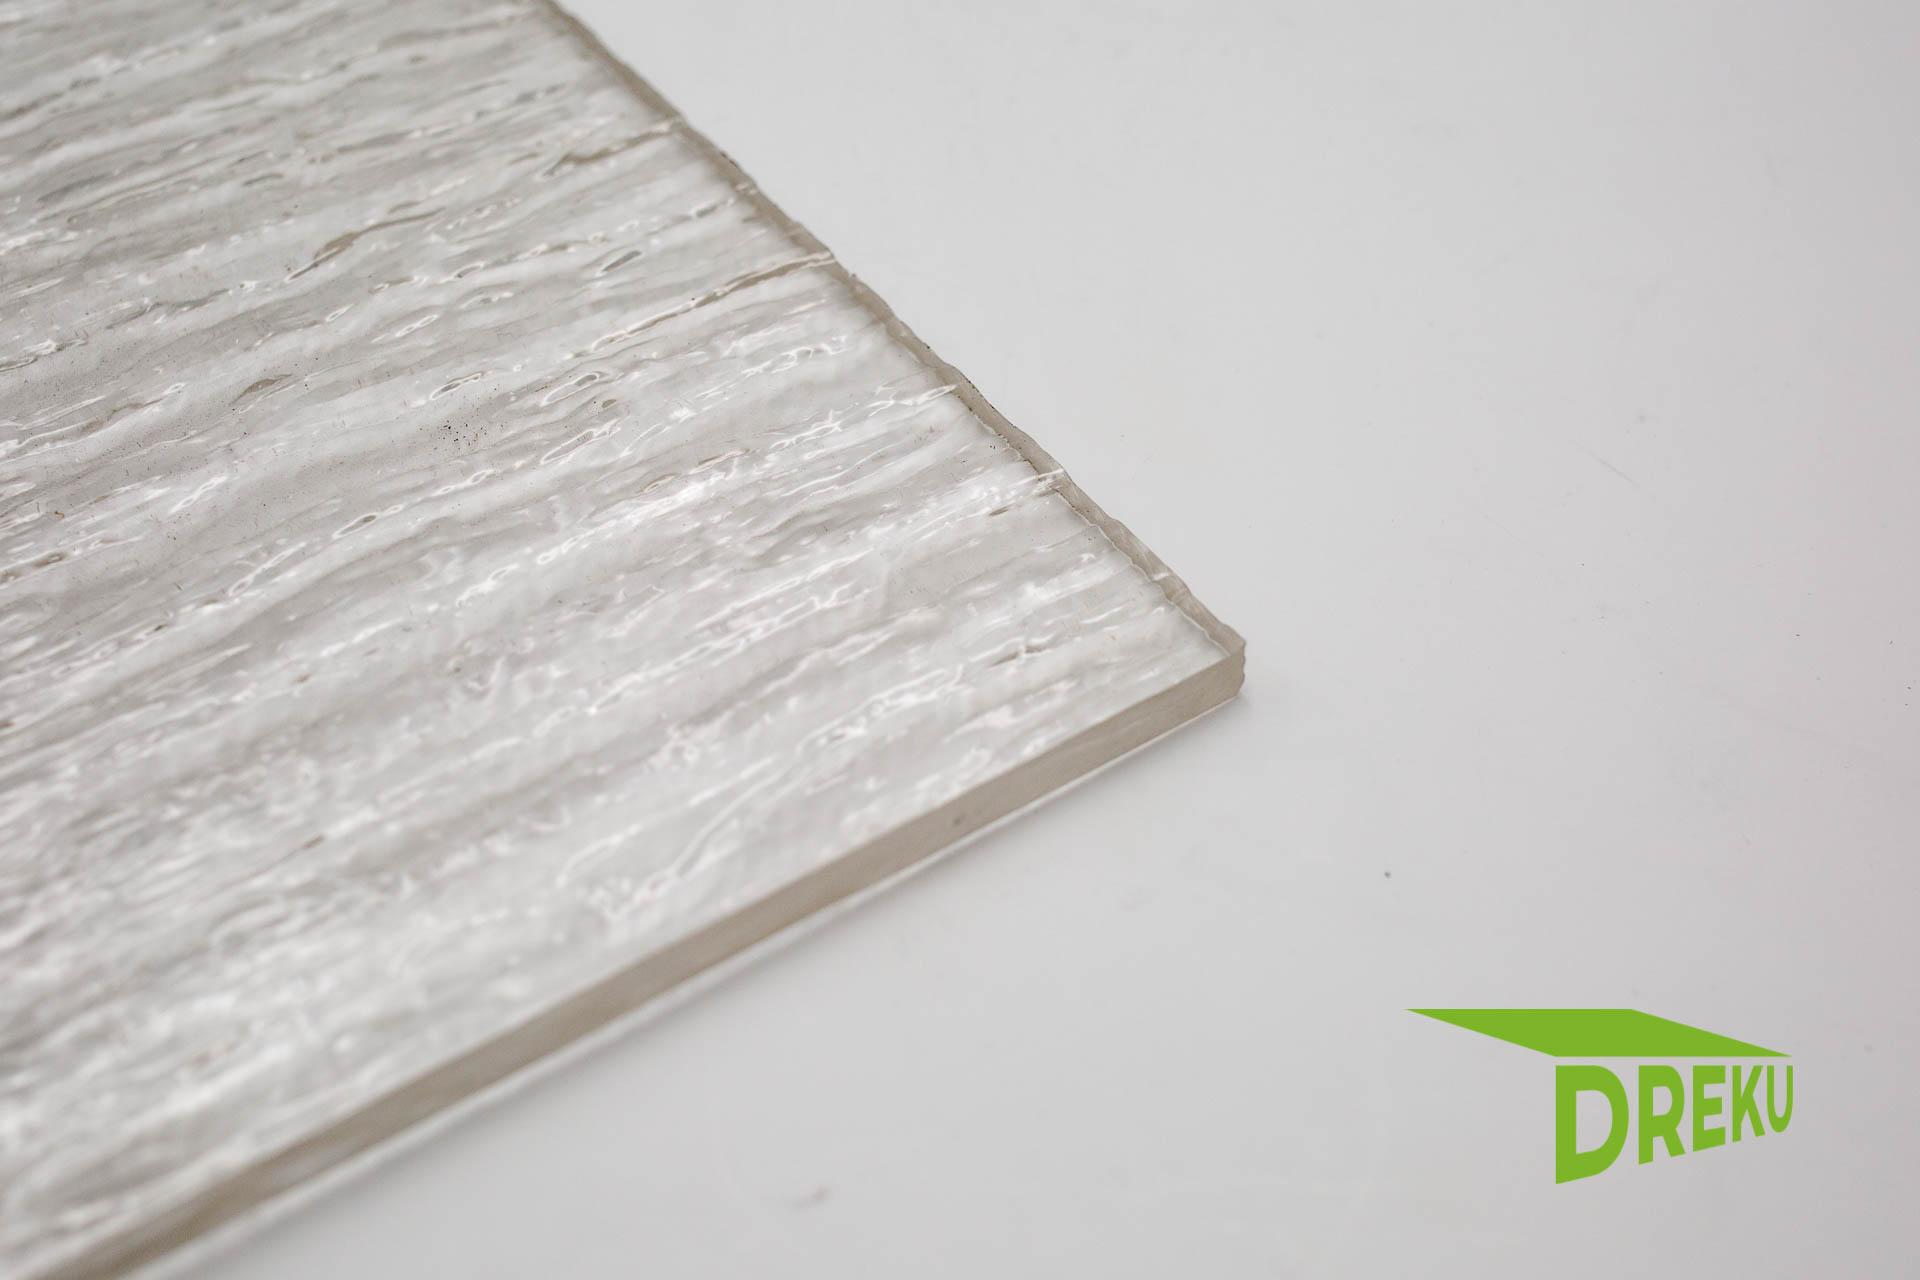 Acrylglas 6 mm baumrinde klar dreku gmbh for Acrylglas kuchenruckwand gunstig